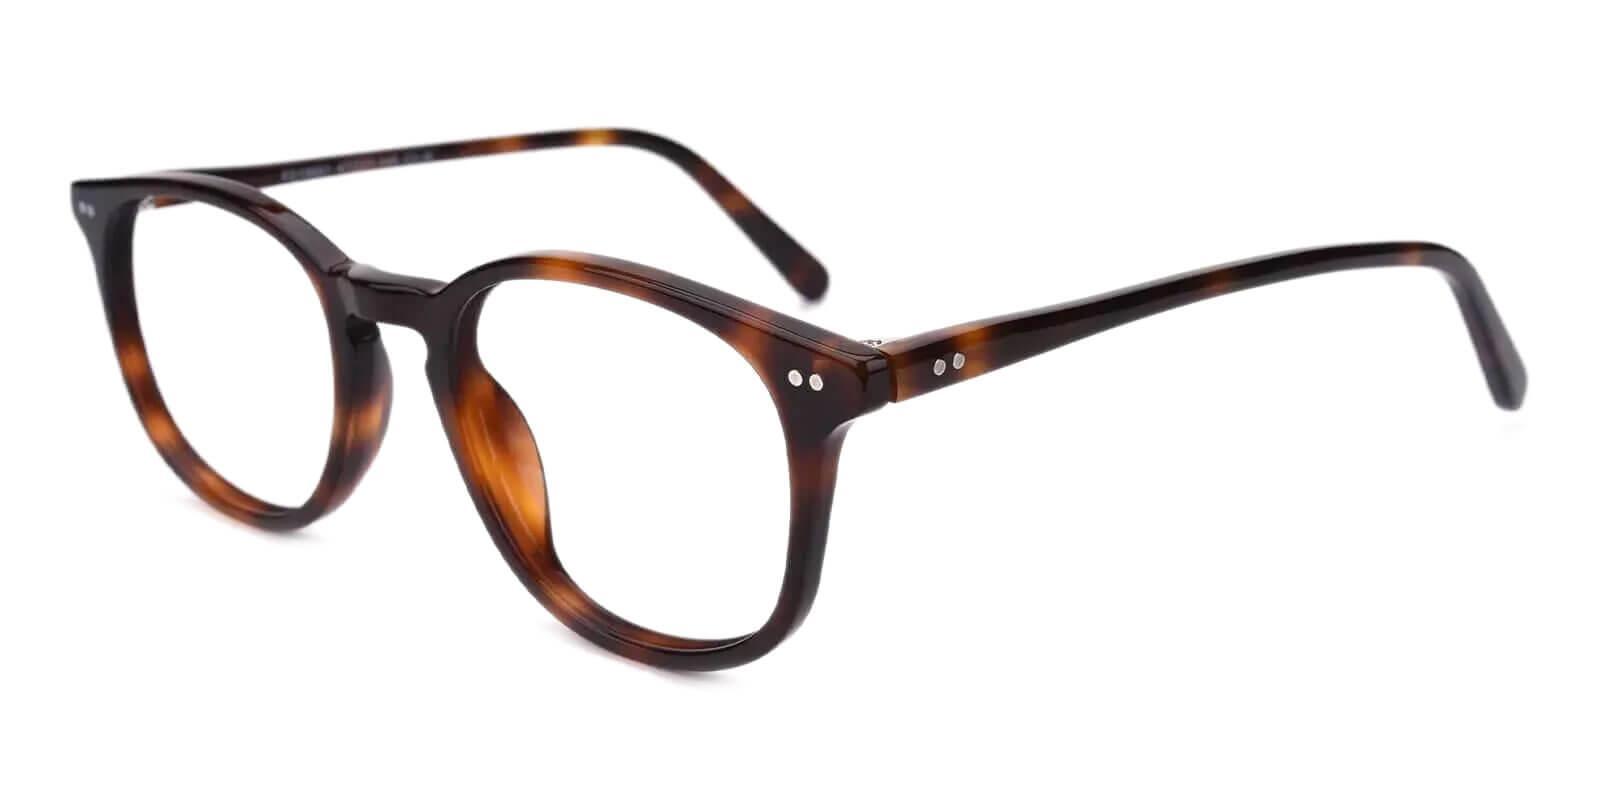 Venus Tortoise Acetate Eyeglasses , UniversalBridgeFit Frames from ABBE Glasses